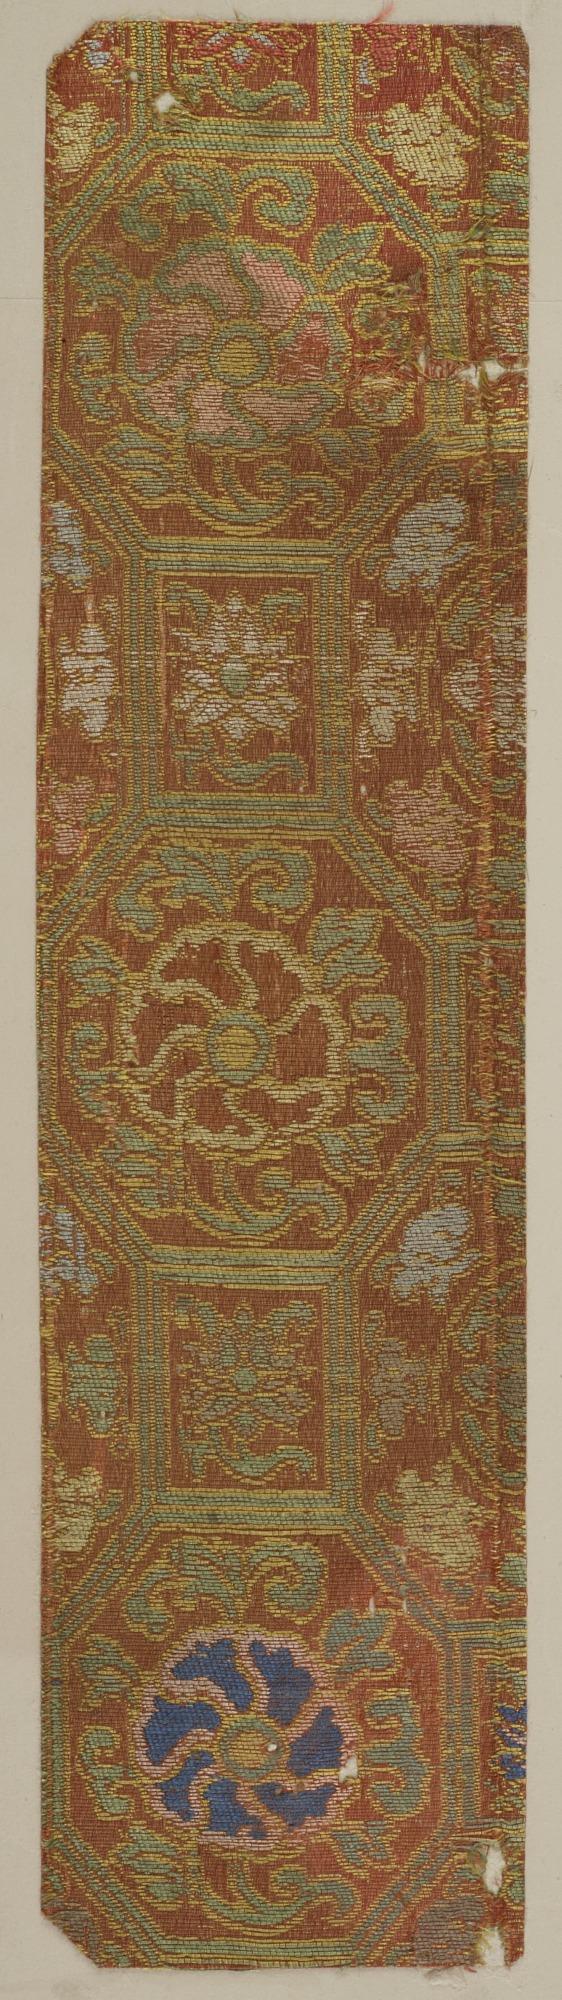 Brocade, silk. A sample